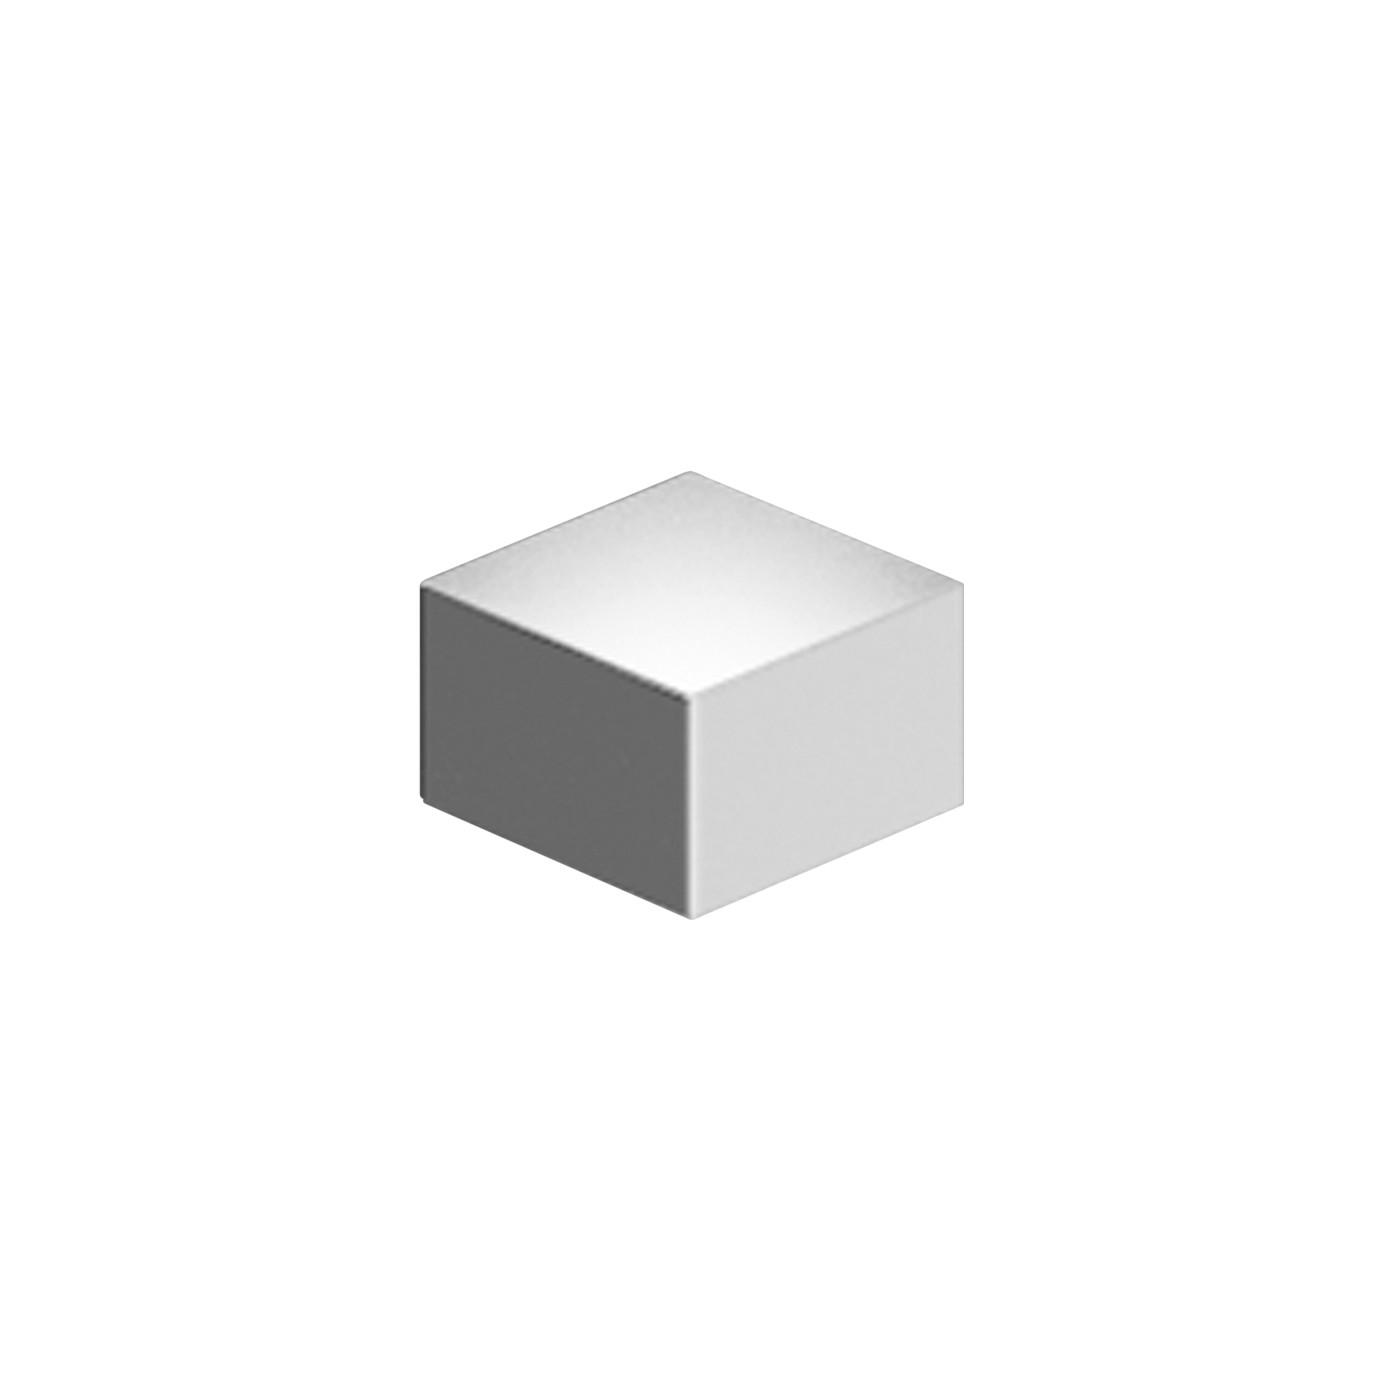 Vibia Fold Surface 4200